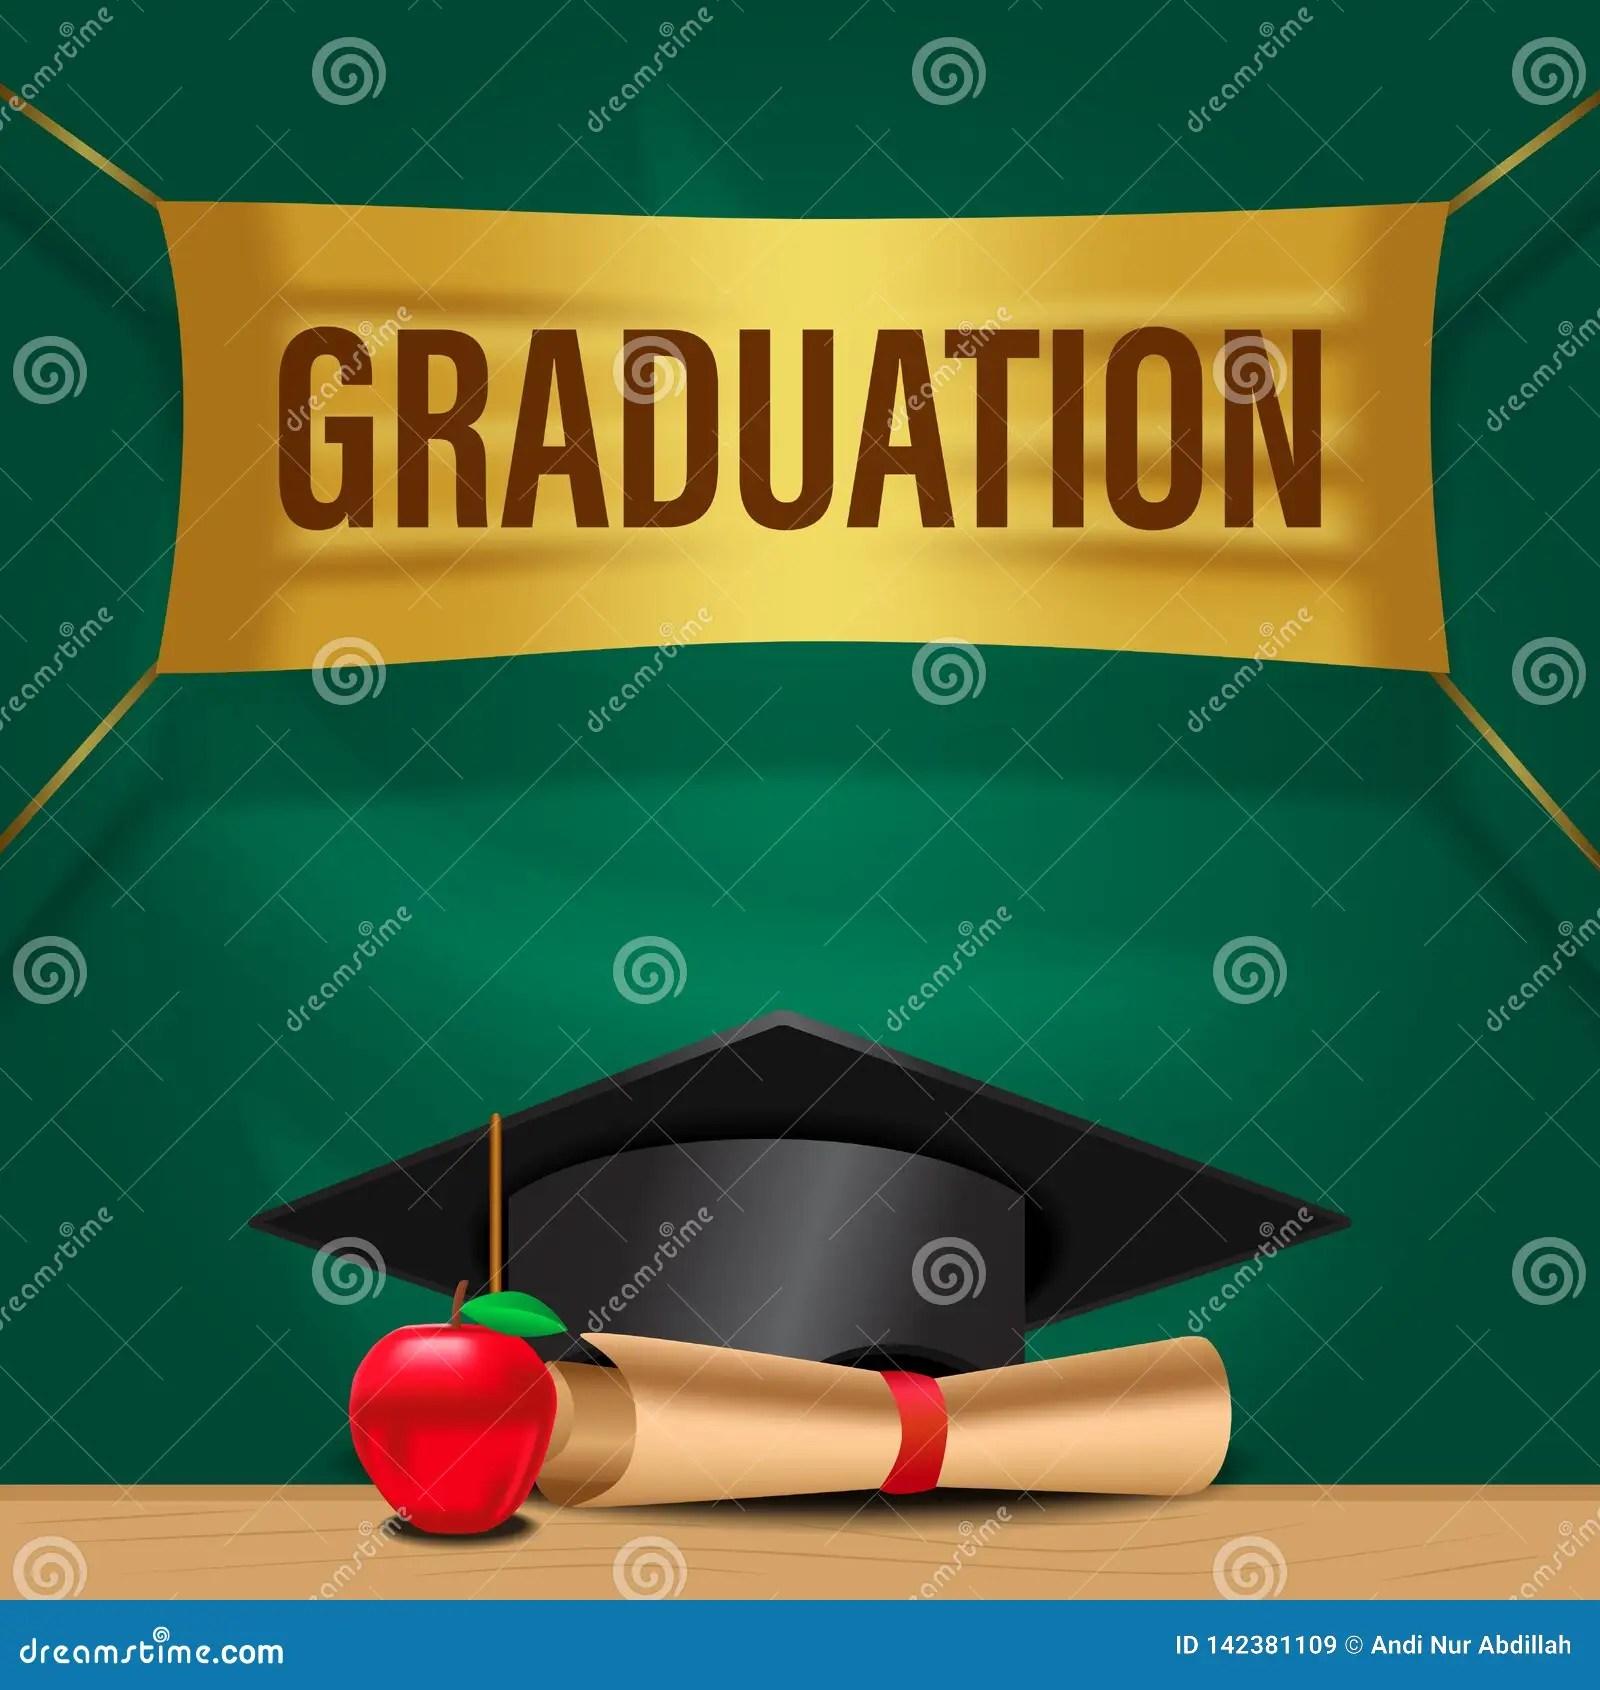 https www dreamstime com web luxury graduation party invitation card hat paper apple green board graduate school collage celebration event image142381109